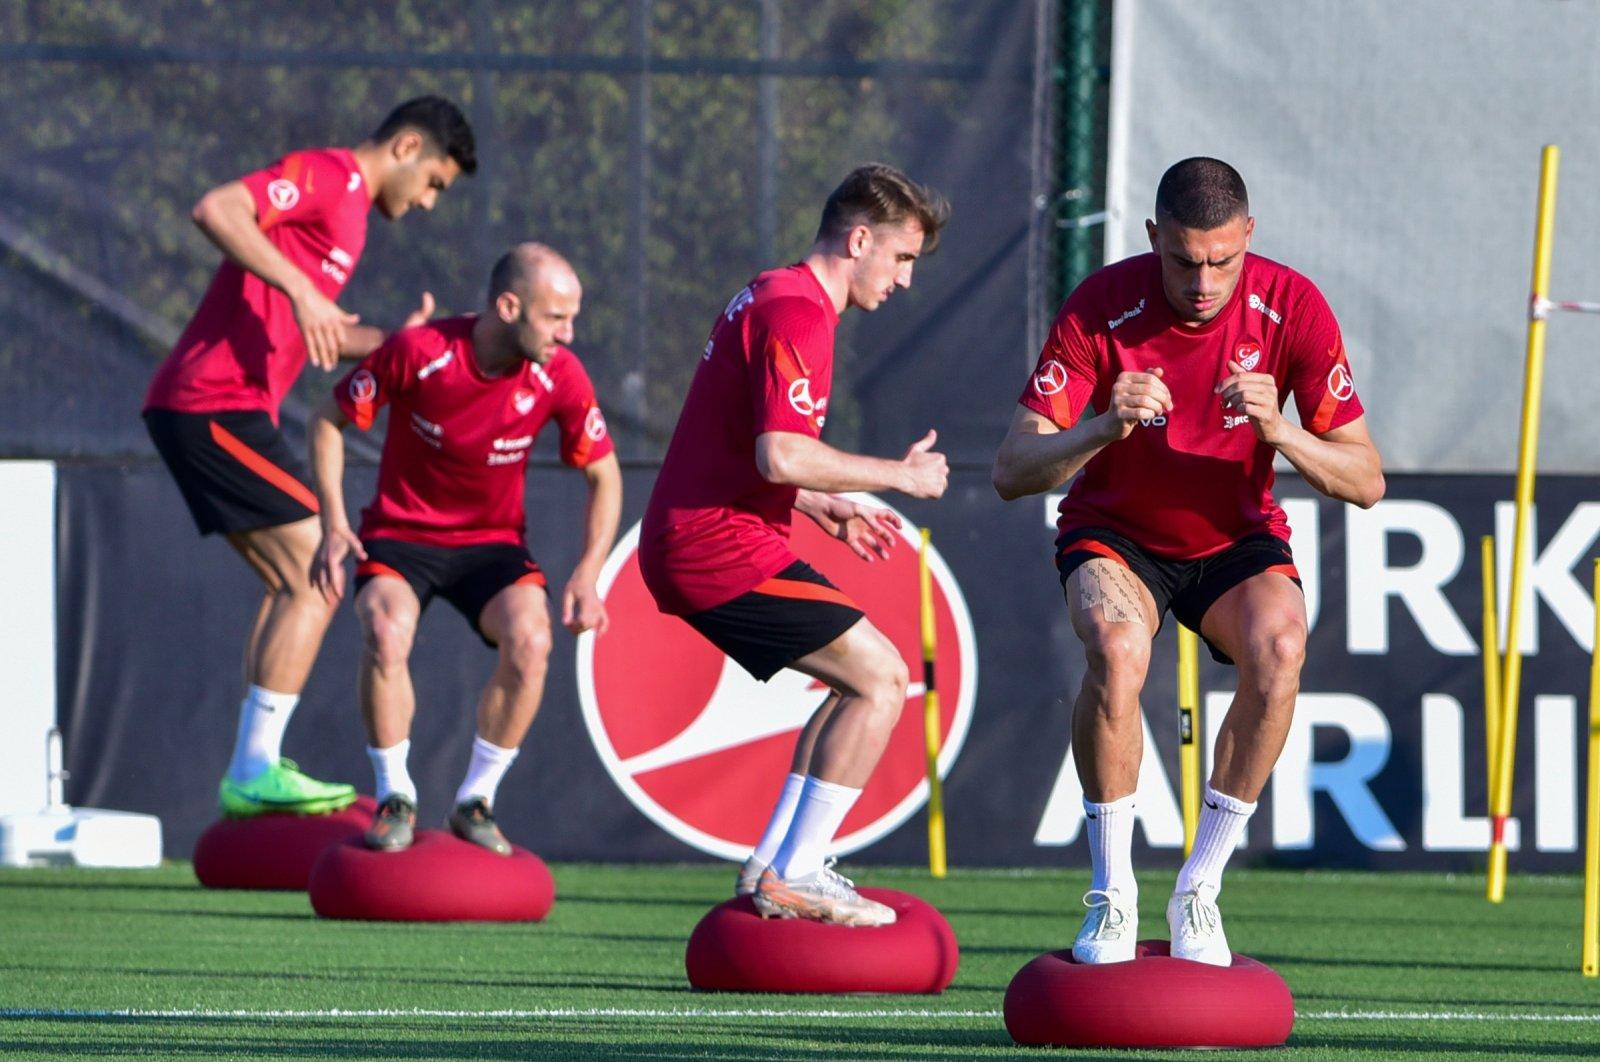 Turkish national football team players train ahead of their friendly match against Guinea, Antalya, western Turkey, May 29, 2021. (DHA Photo)